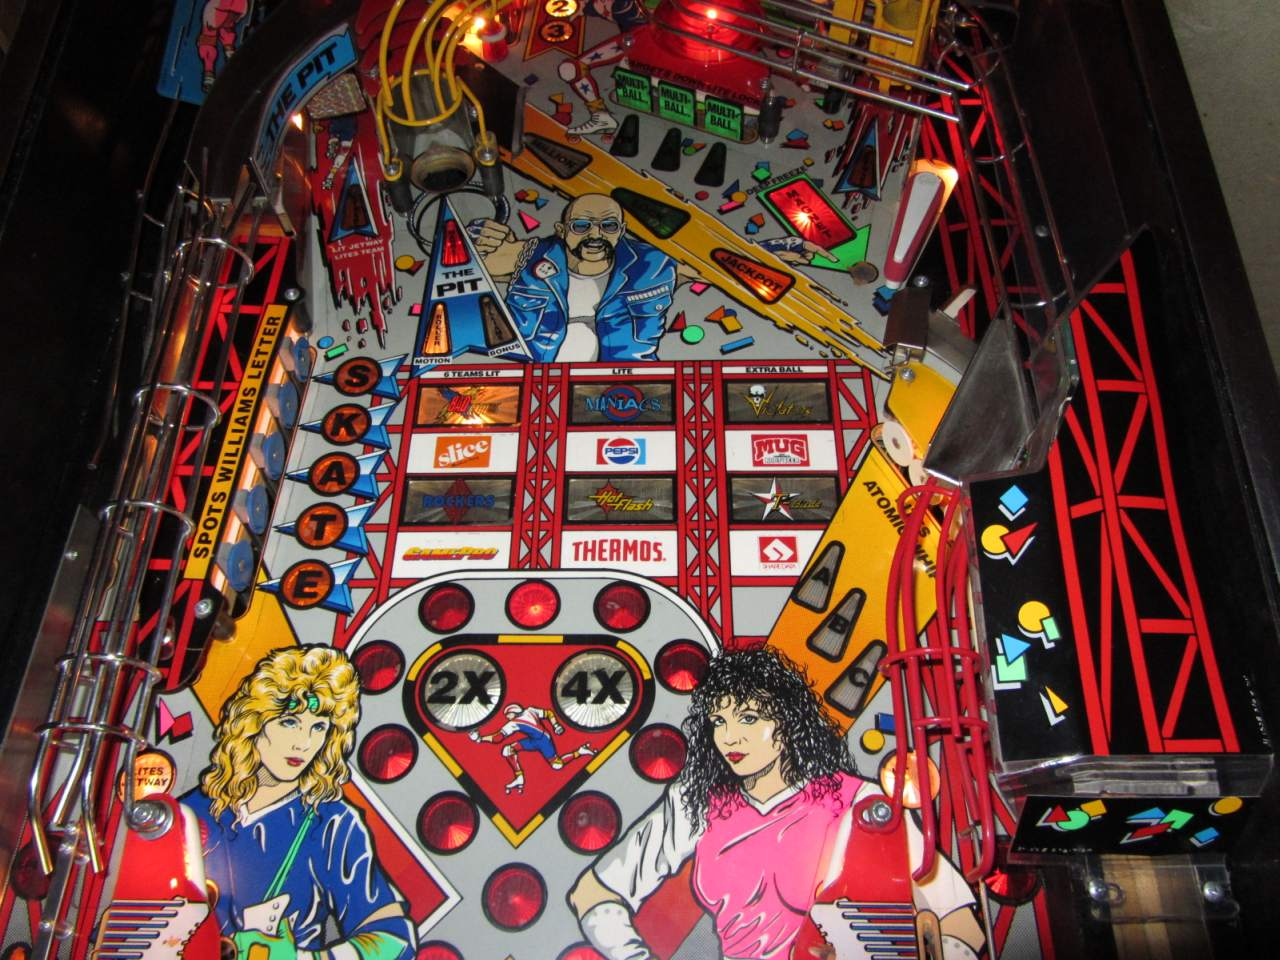 Williams Rollergames Pinball Machine 3 Pinballmania Llc